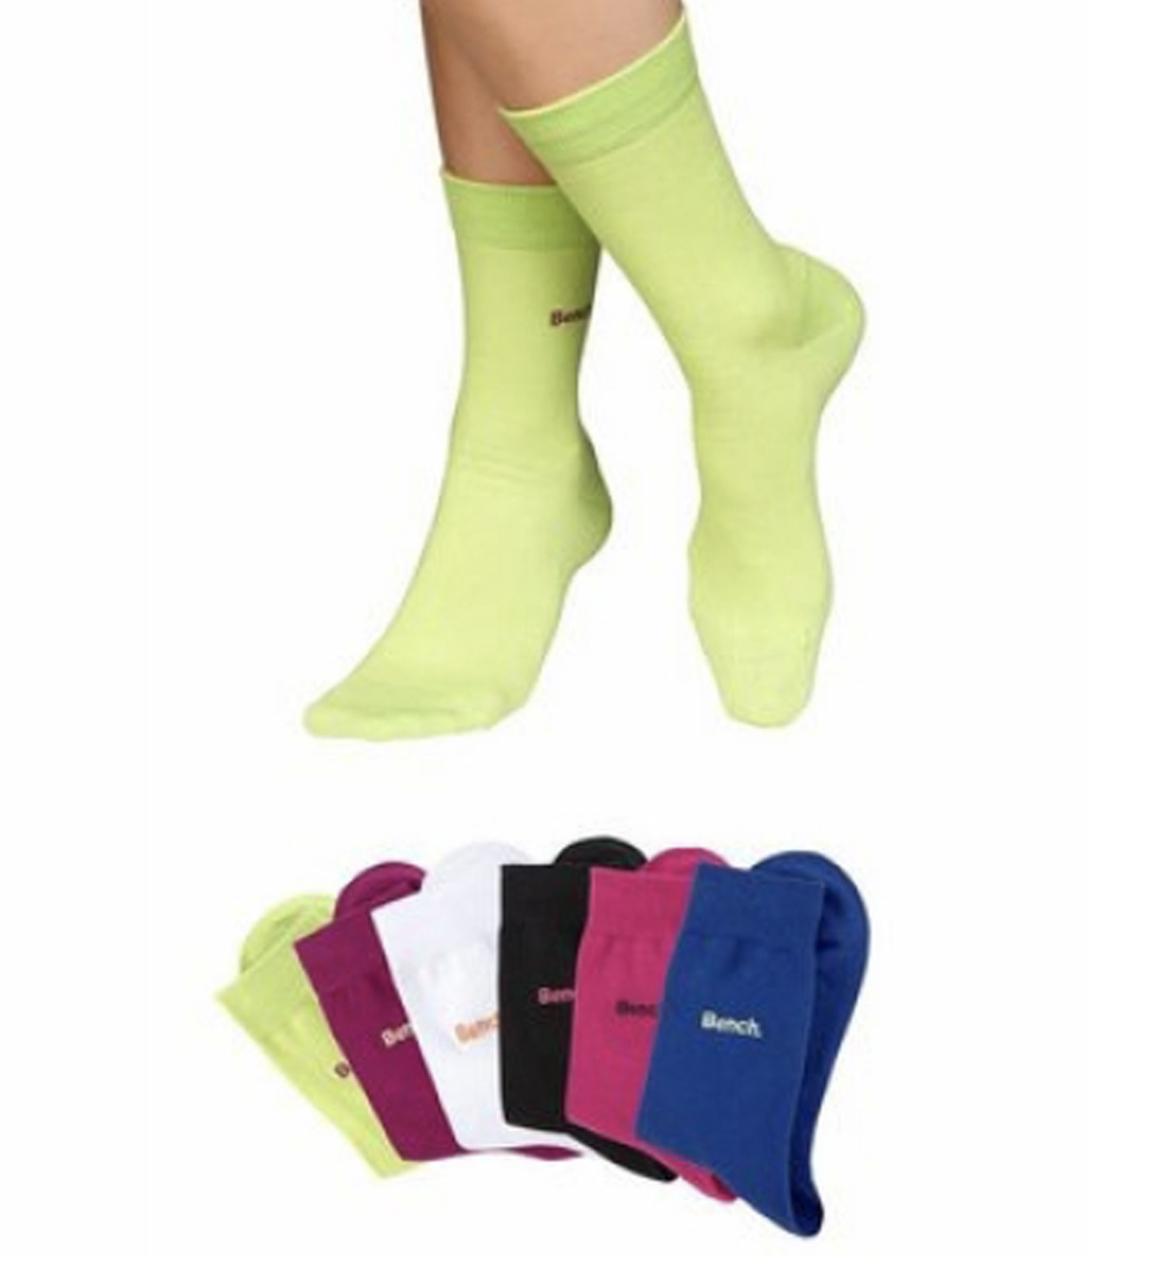 18 Paar bunte Bench.  Socken Größe 43-46 78% Baumwolle.